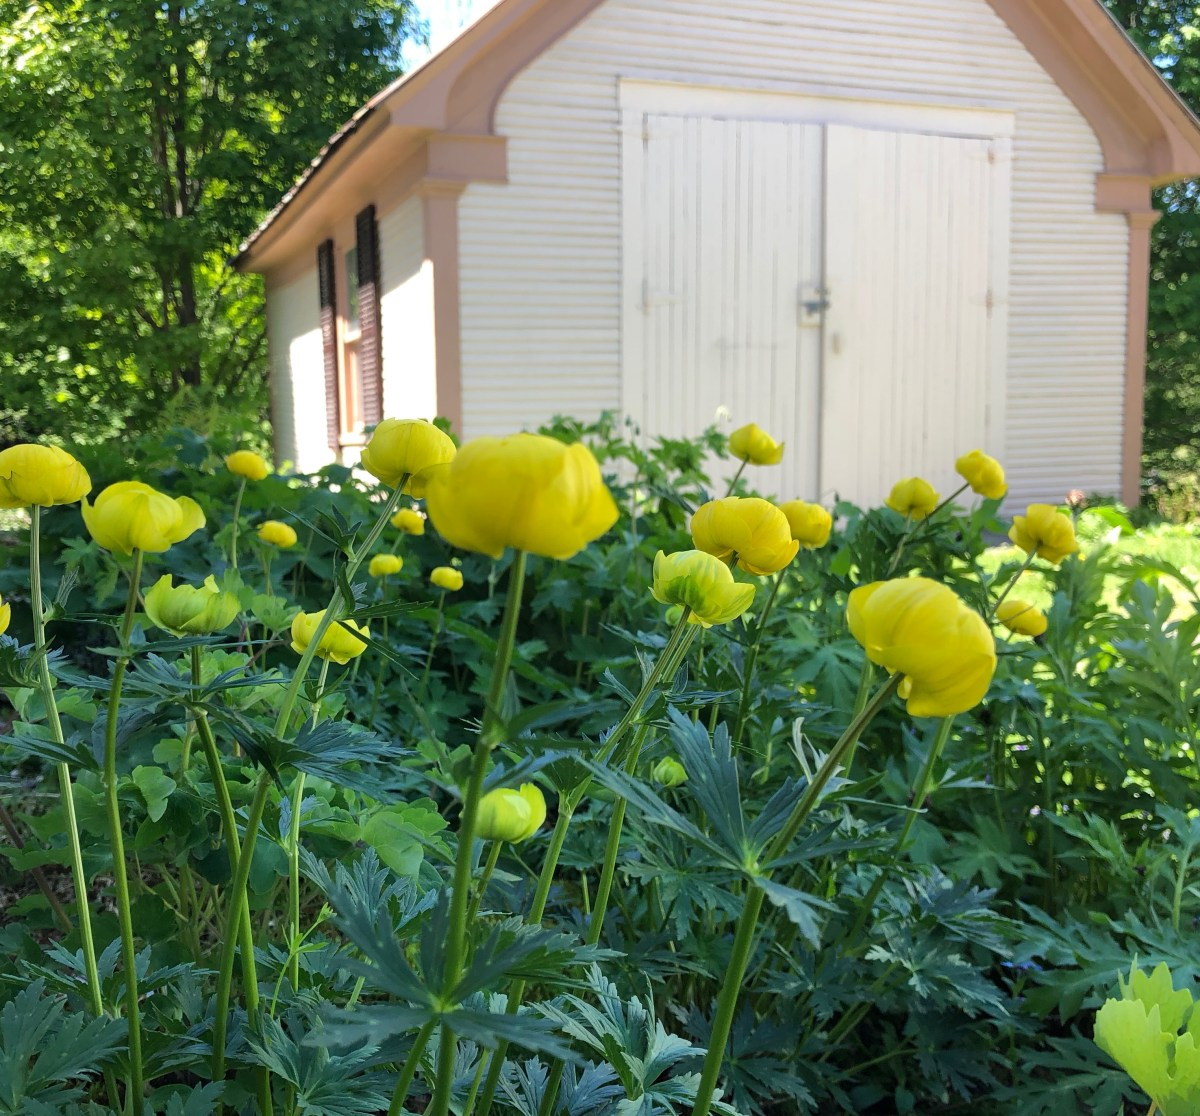 Globeflower, Trollius europeaus